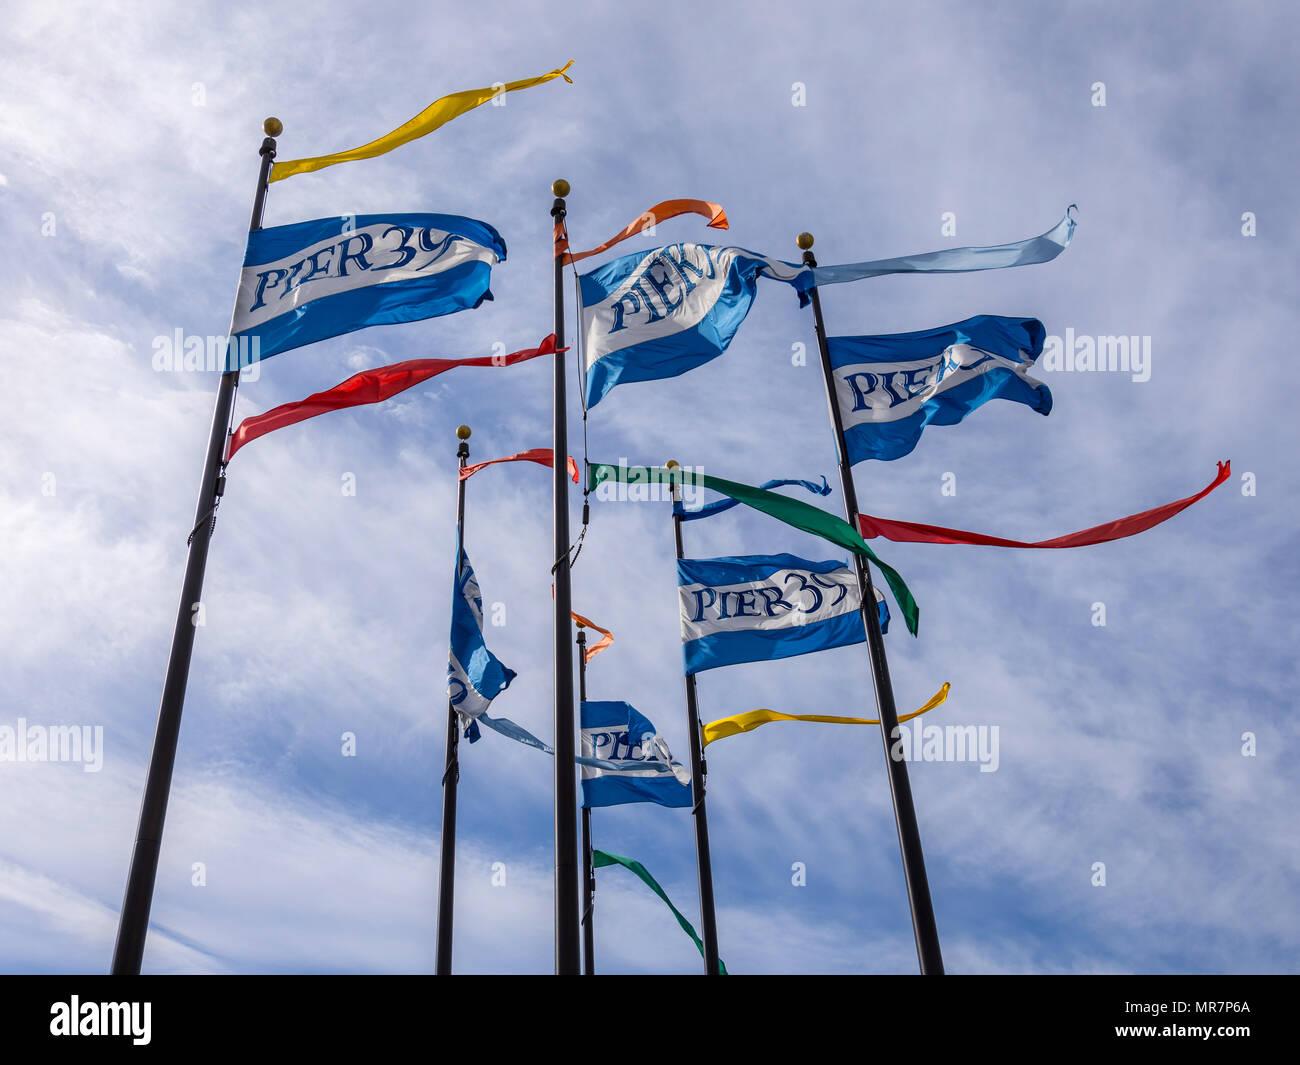 Flags on Pier 39, San Francisco, CA; USA. - Stock Image